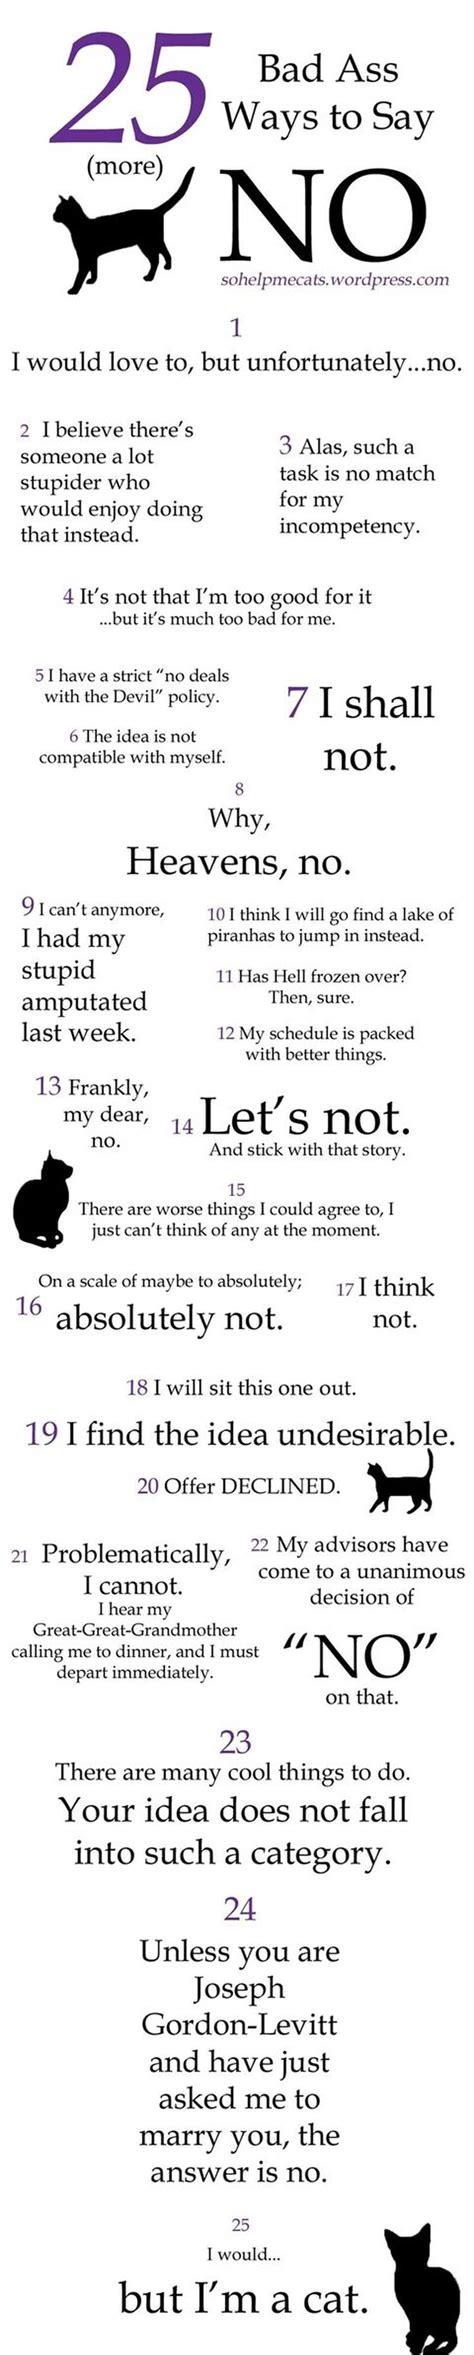 25 Funny Ways To Say No